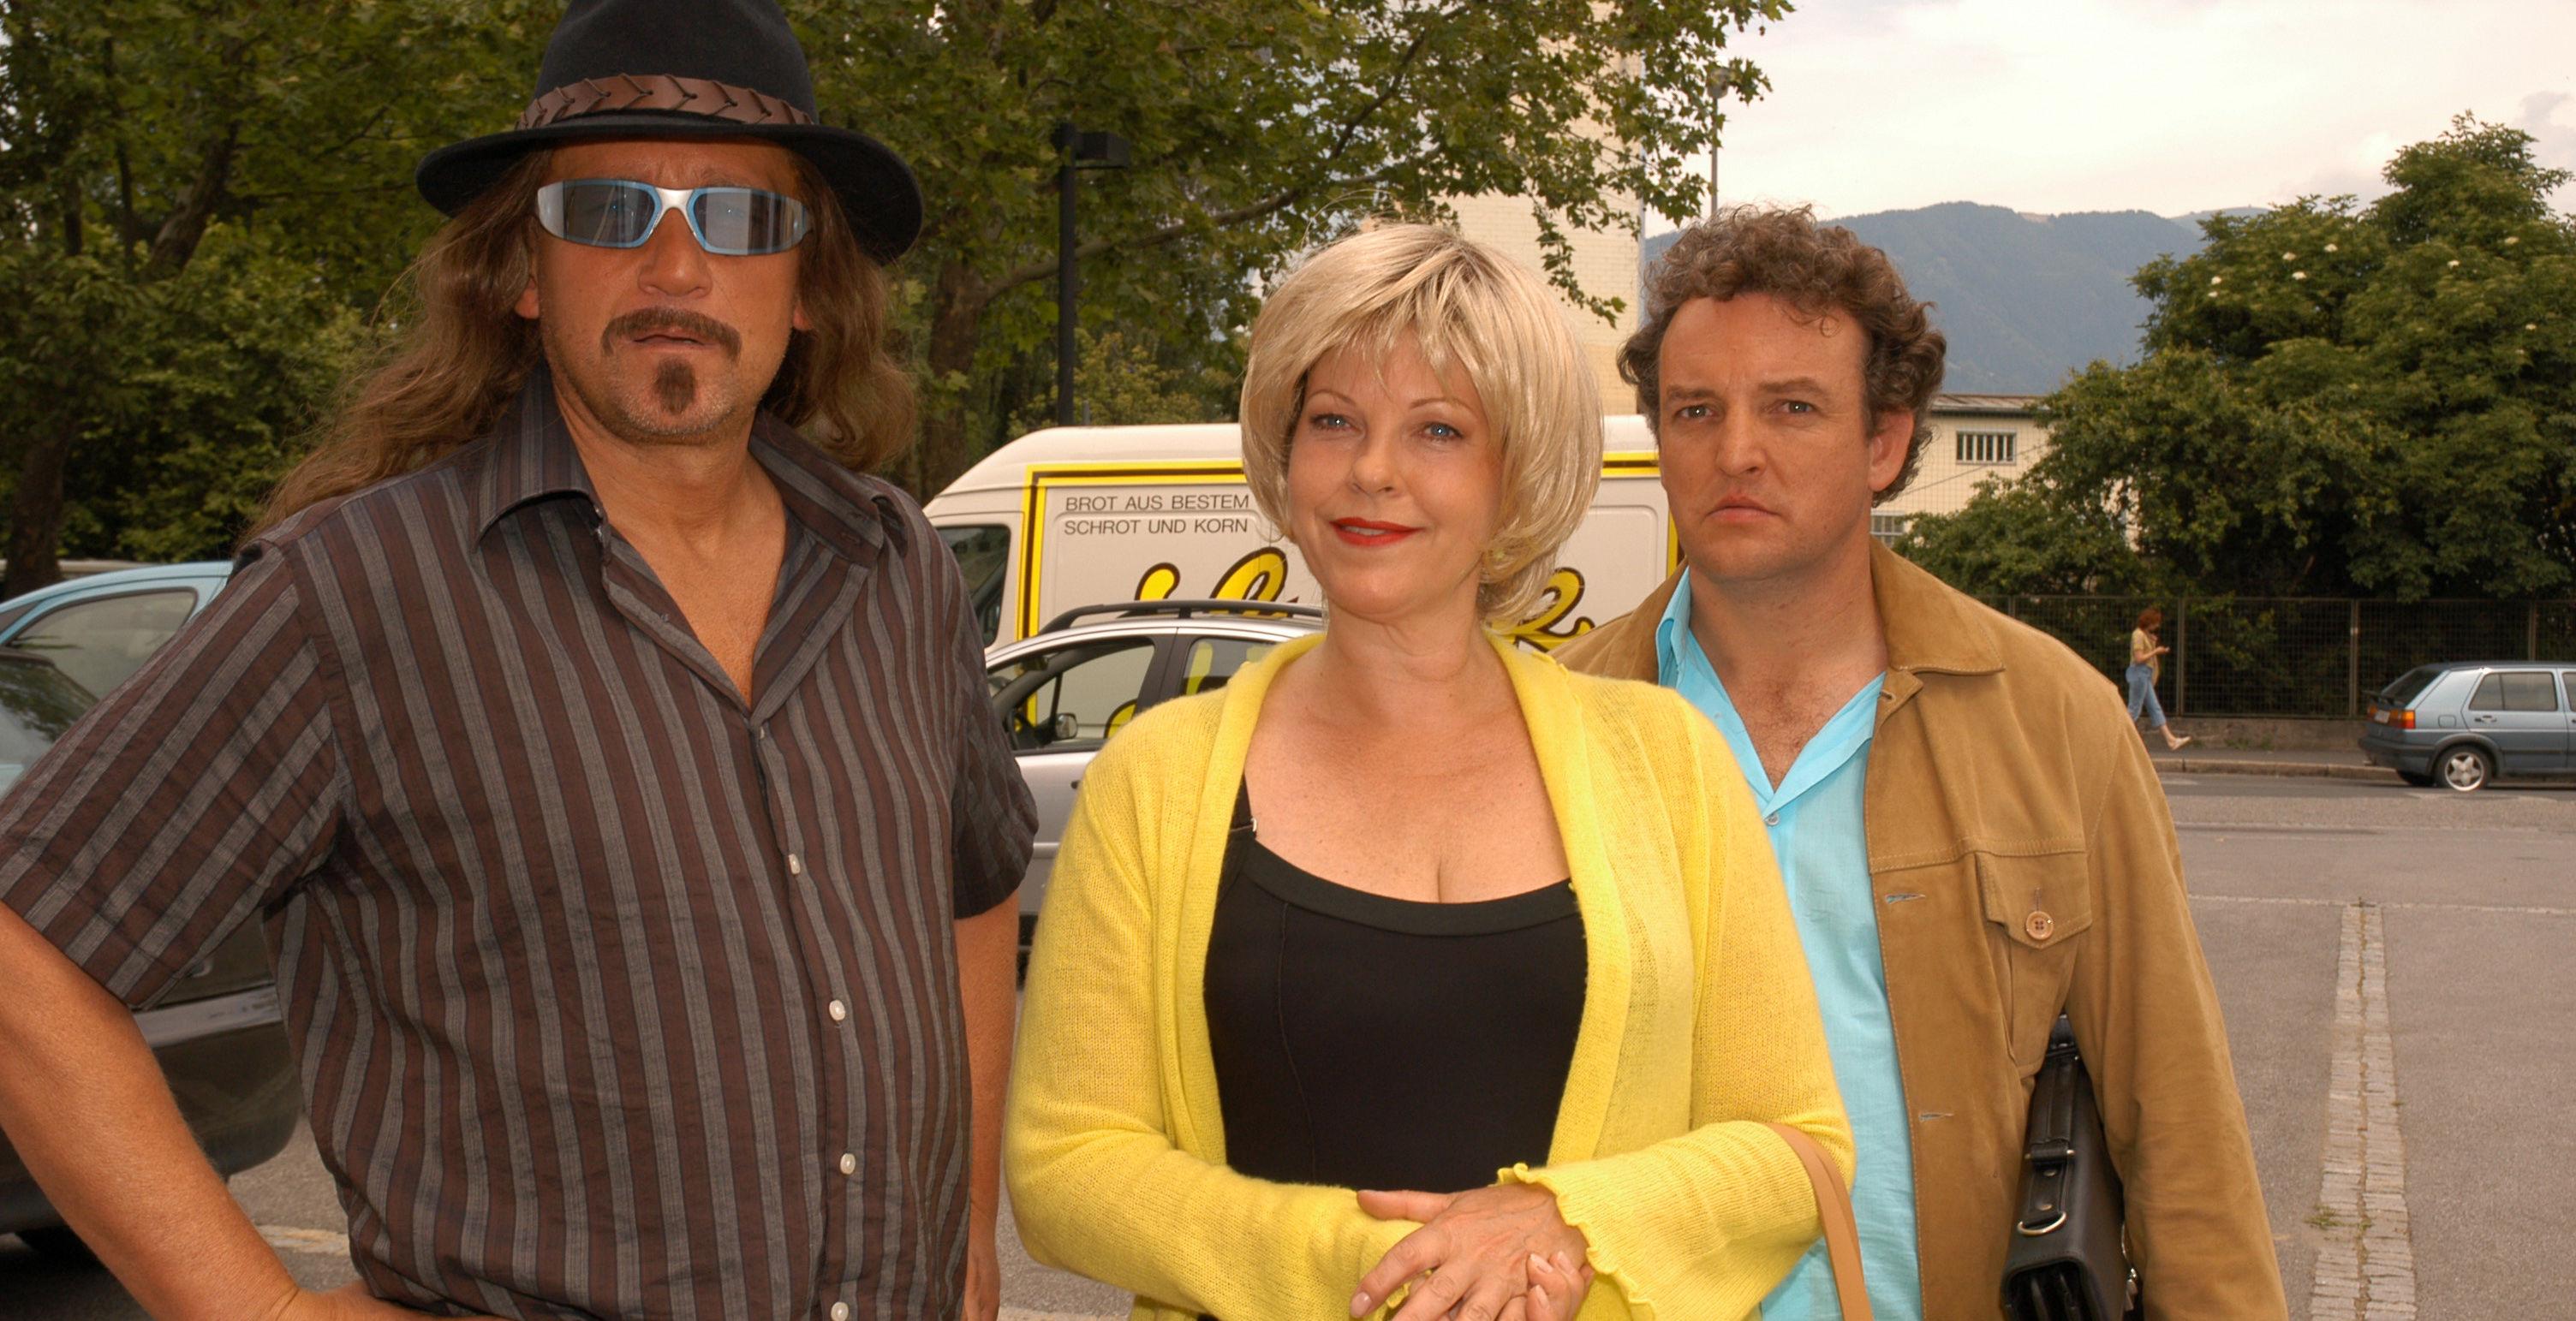 Larry (Rainhard Fendrich), Conny (Elfi Eschke), Freddy (Marco Rima)